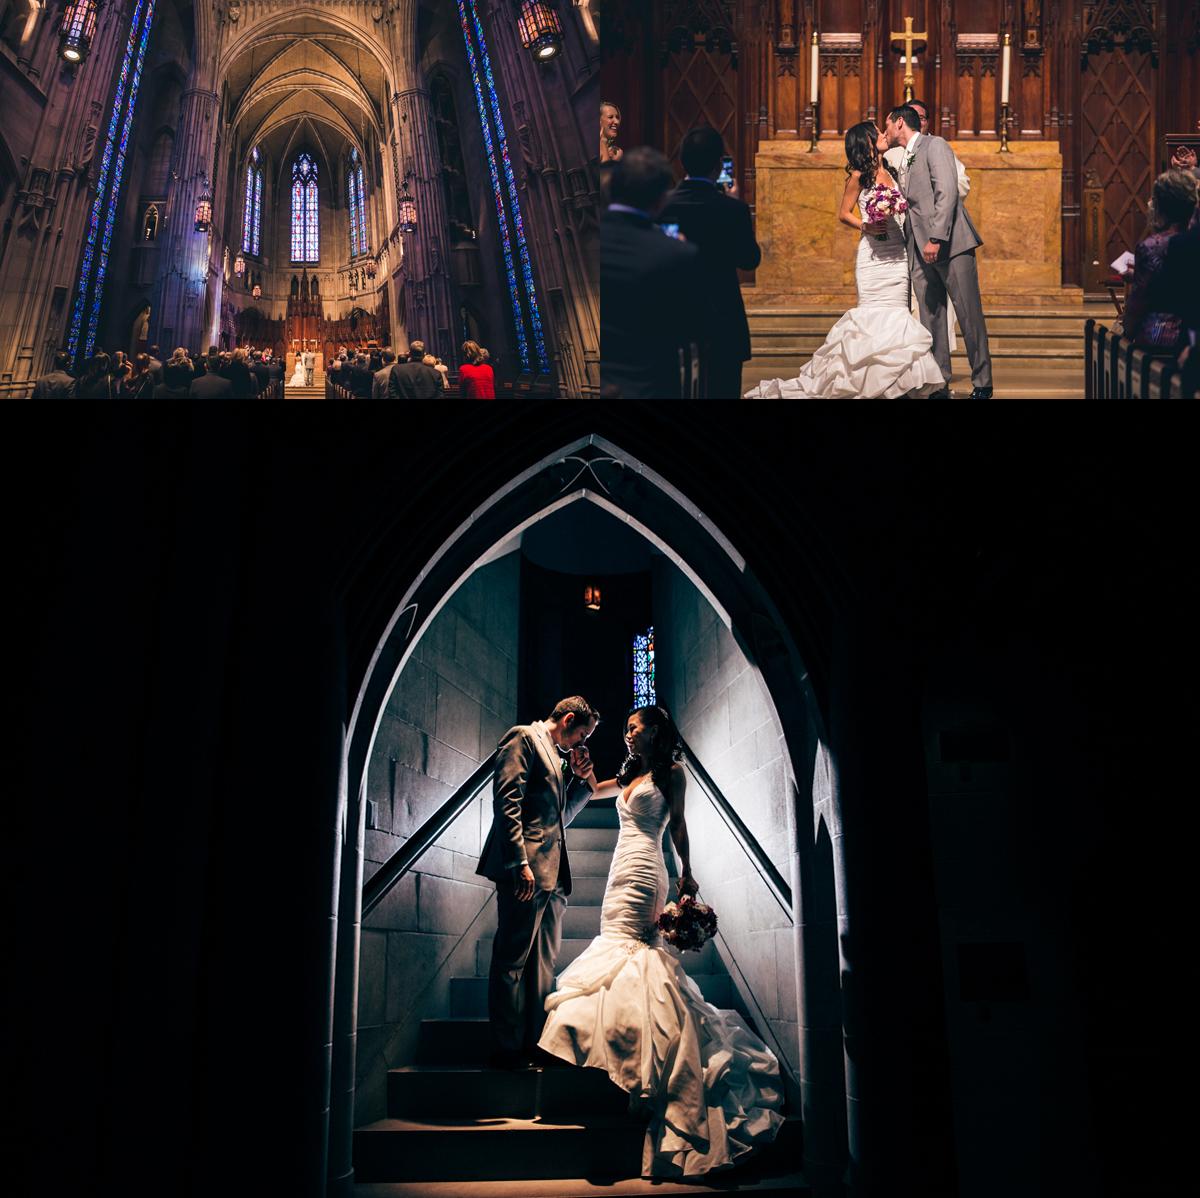 pittsburgh-wedding-photographer-kimly-james-heinz-chapel-pnc-lexus-club-tea-ceremony-11